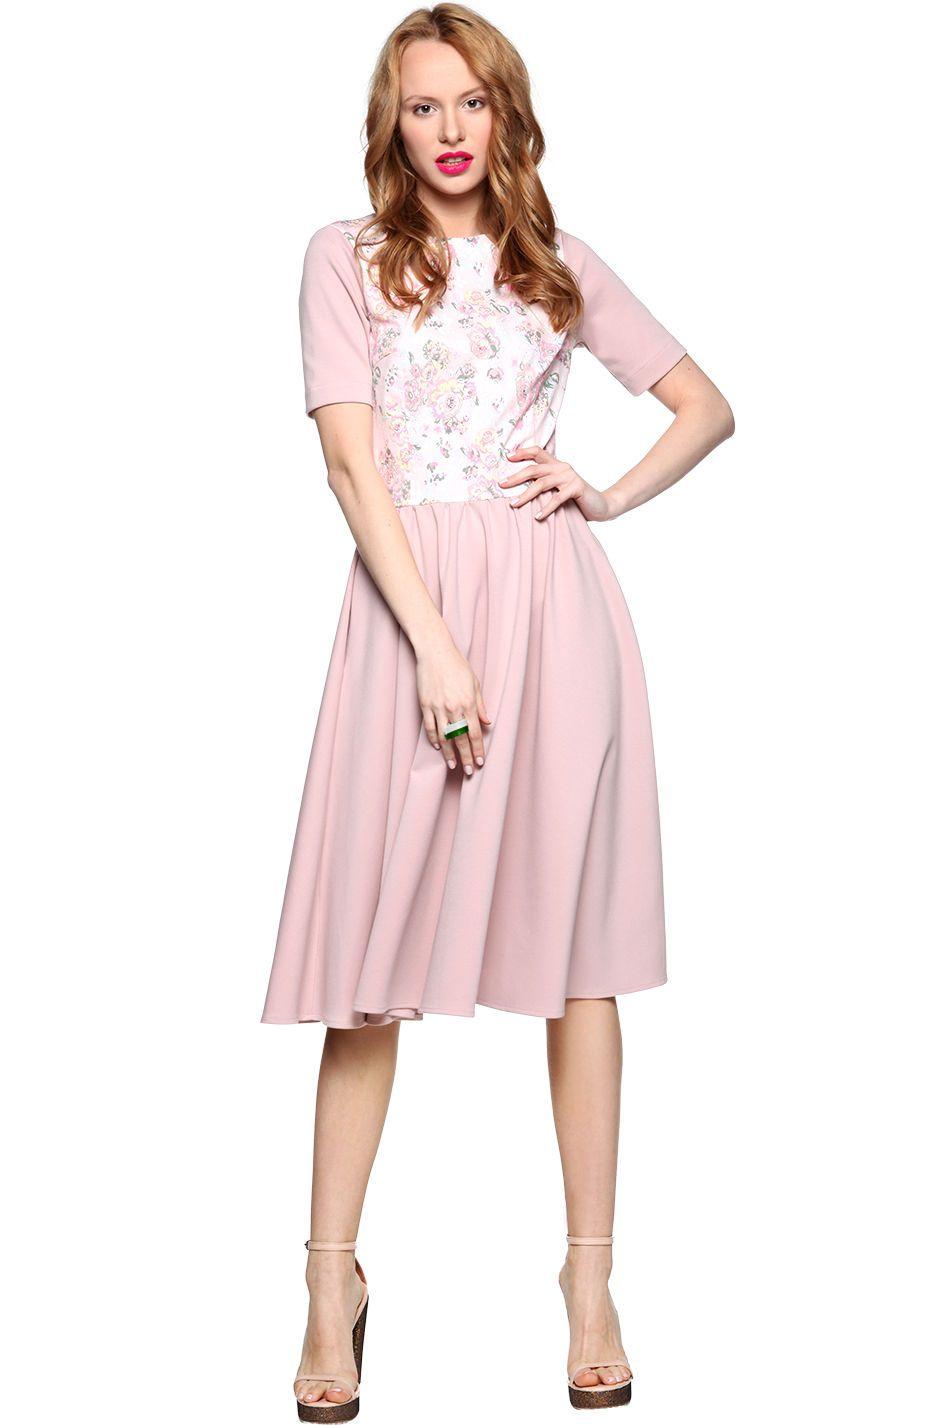 Sukienka Pudrowa Z Kwiatowym Przodem Kasia Miciak Saltandpepper Pl Dresses Graduation Dress Midi Skirt